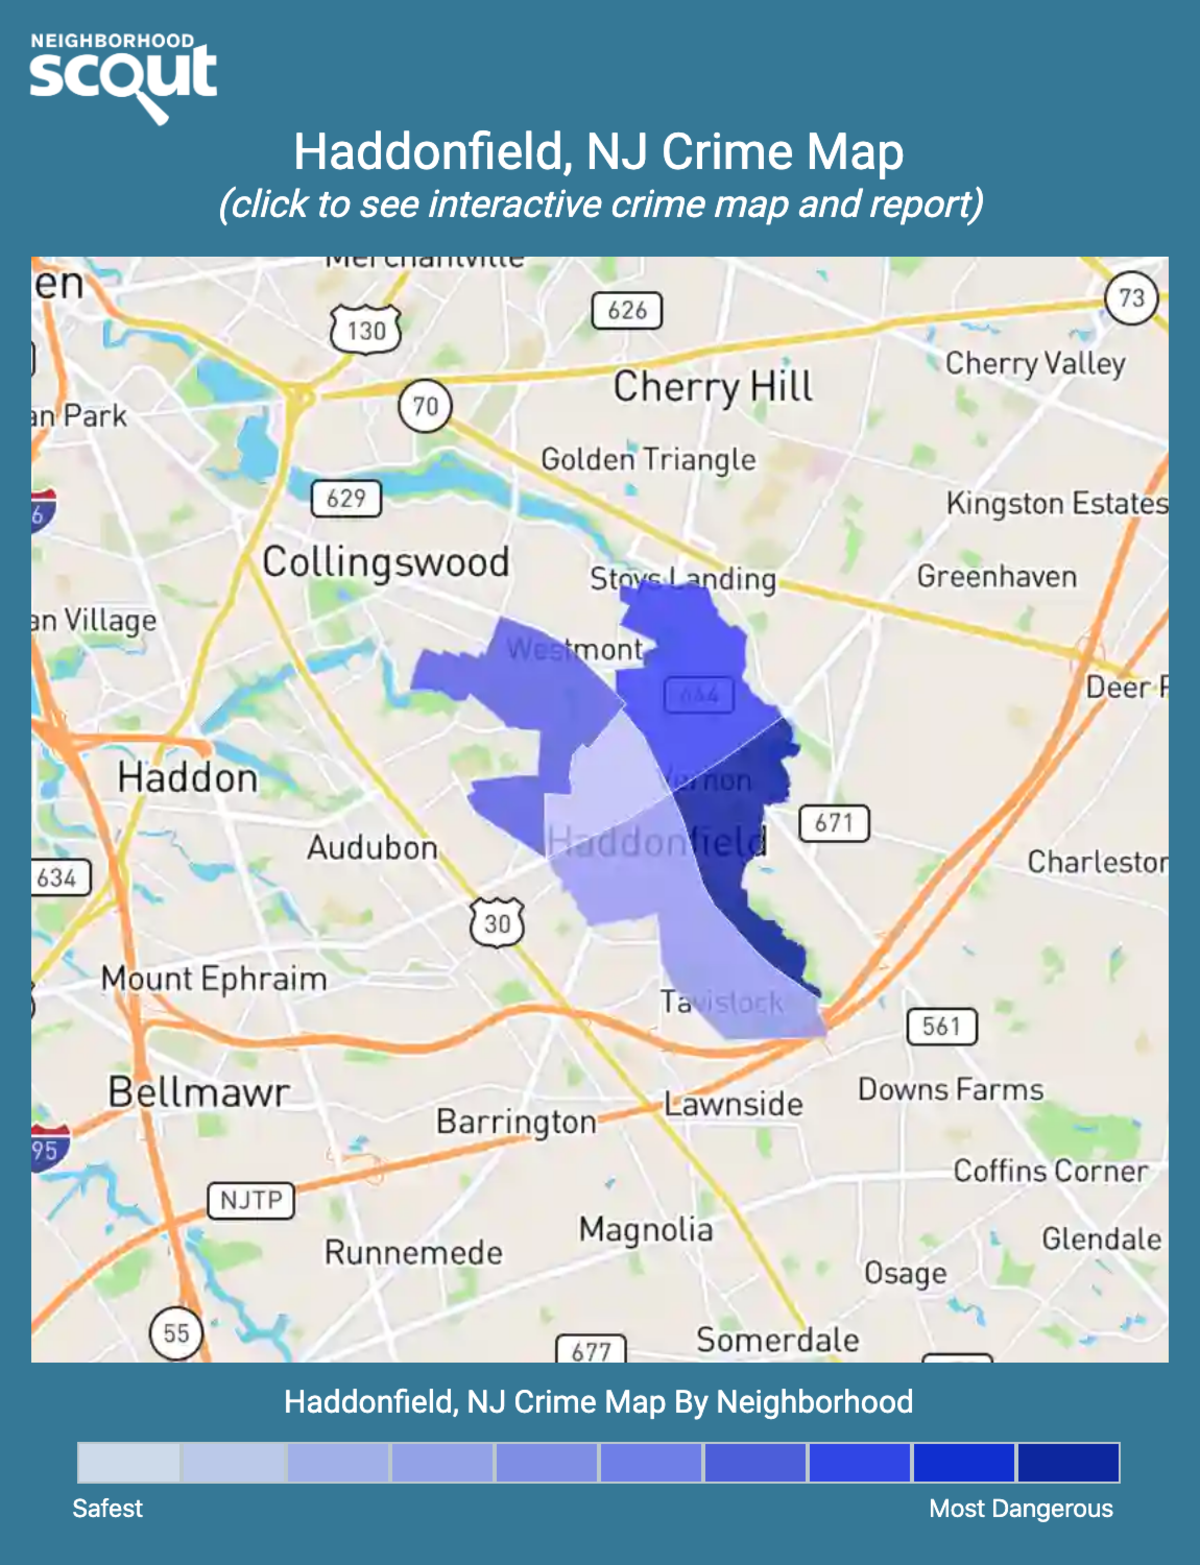 Haddonfield, New Jersey crime map